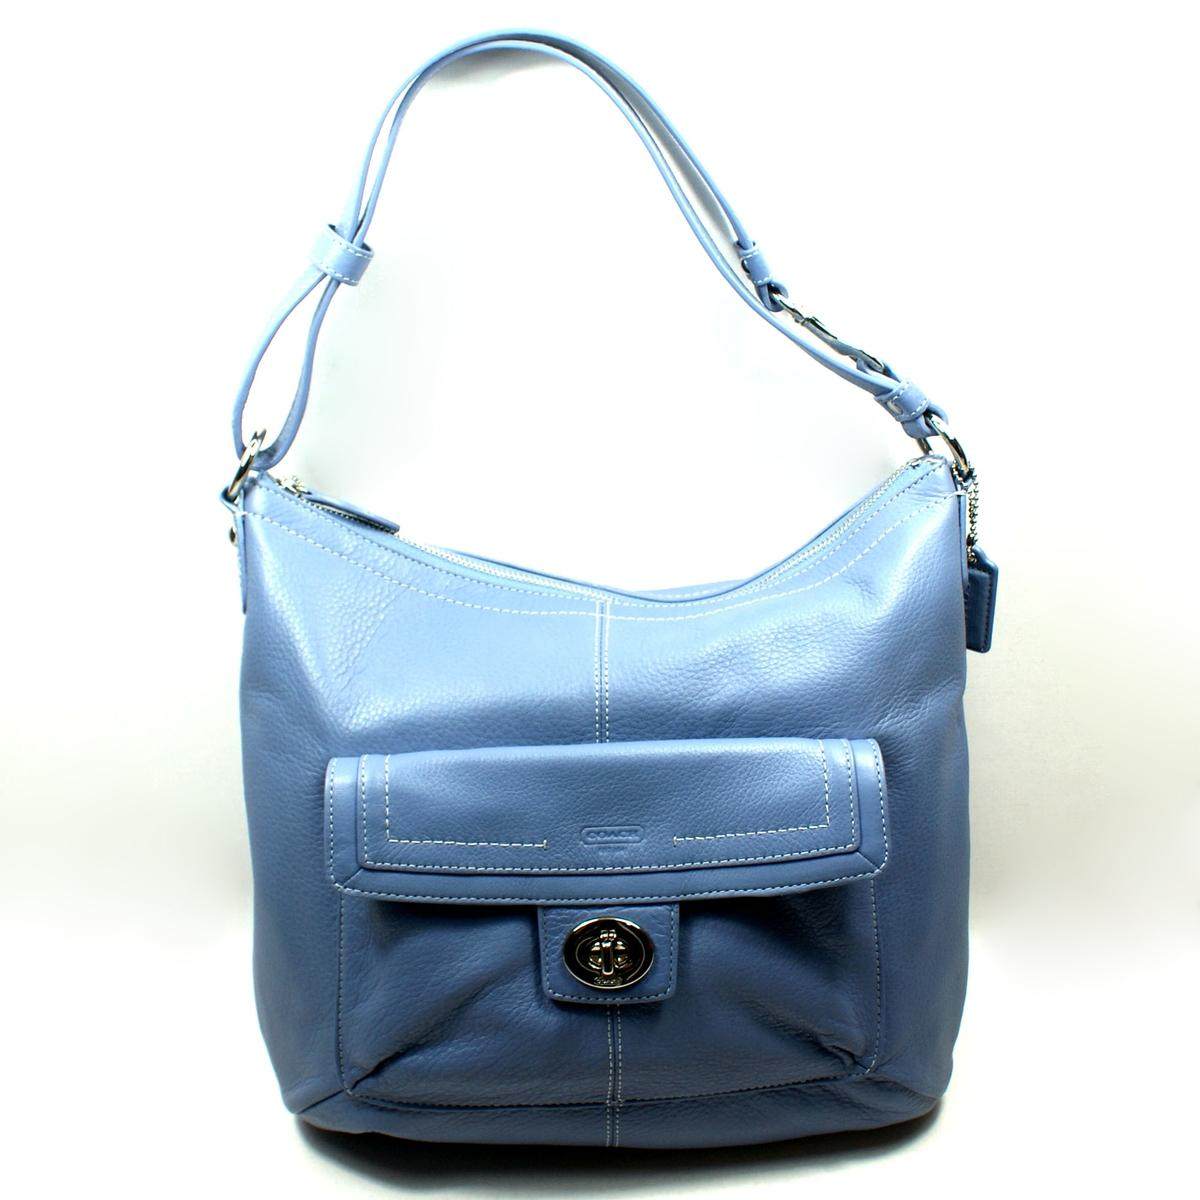 Coach Penelope Leather Convertible Shoulder Bag 88